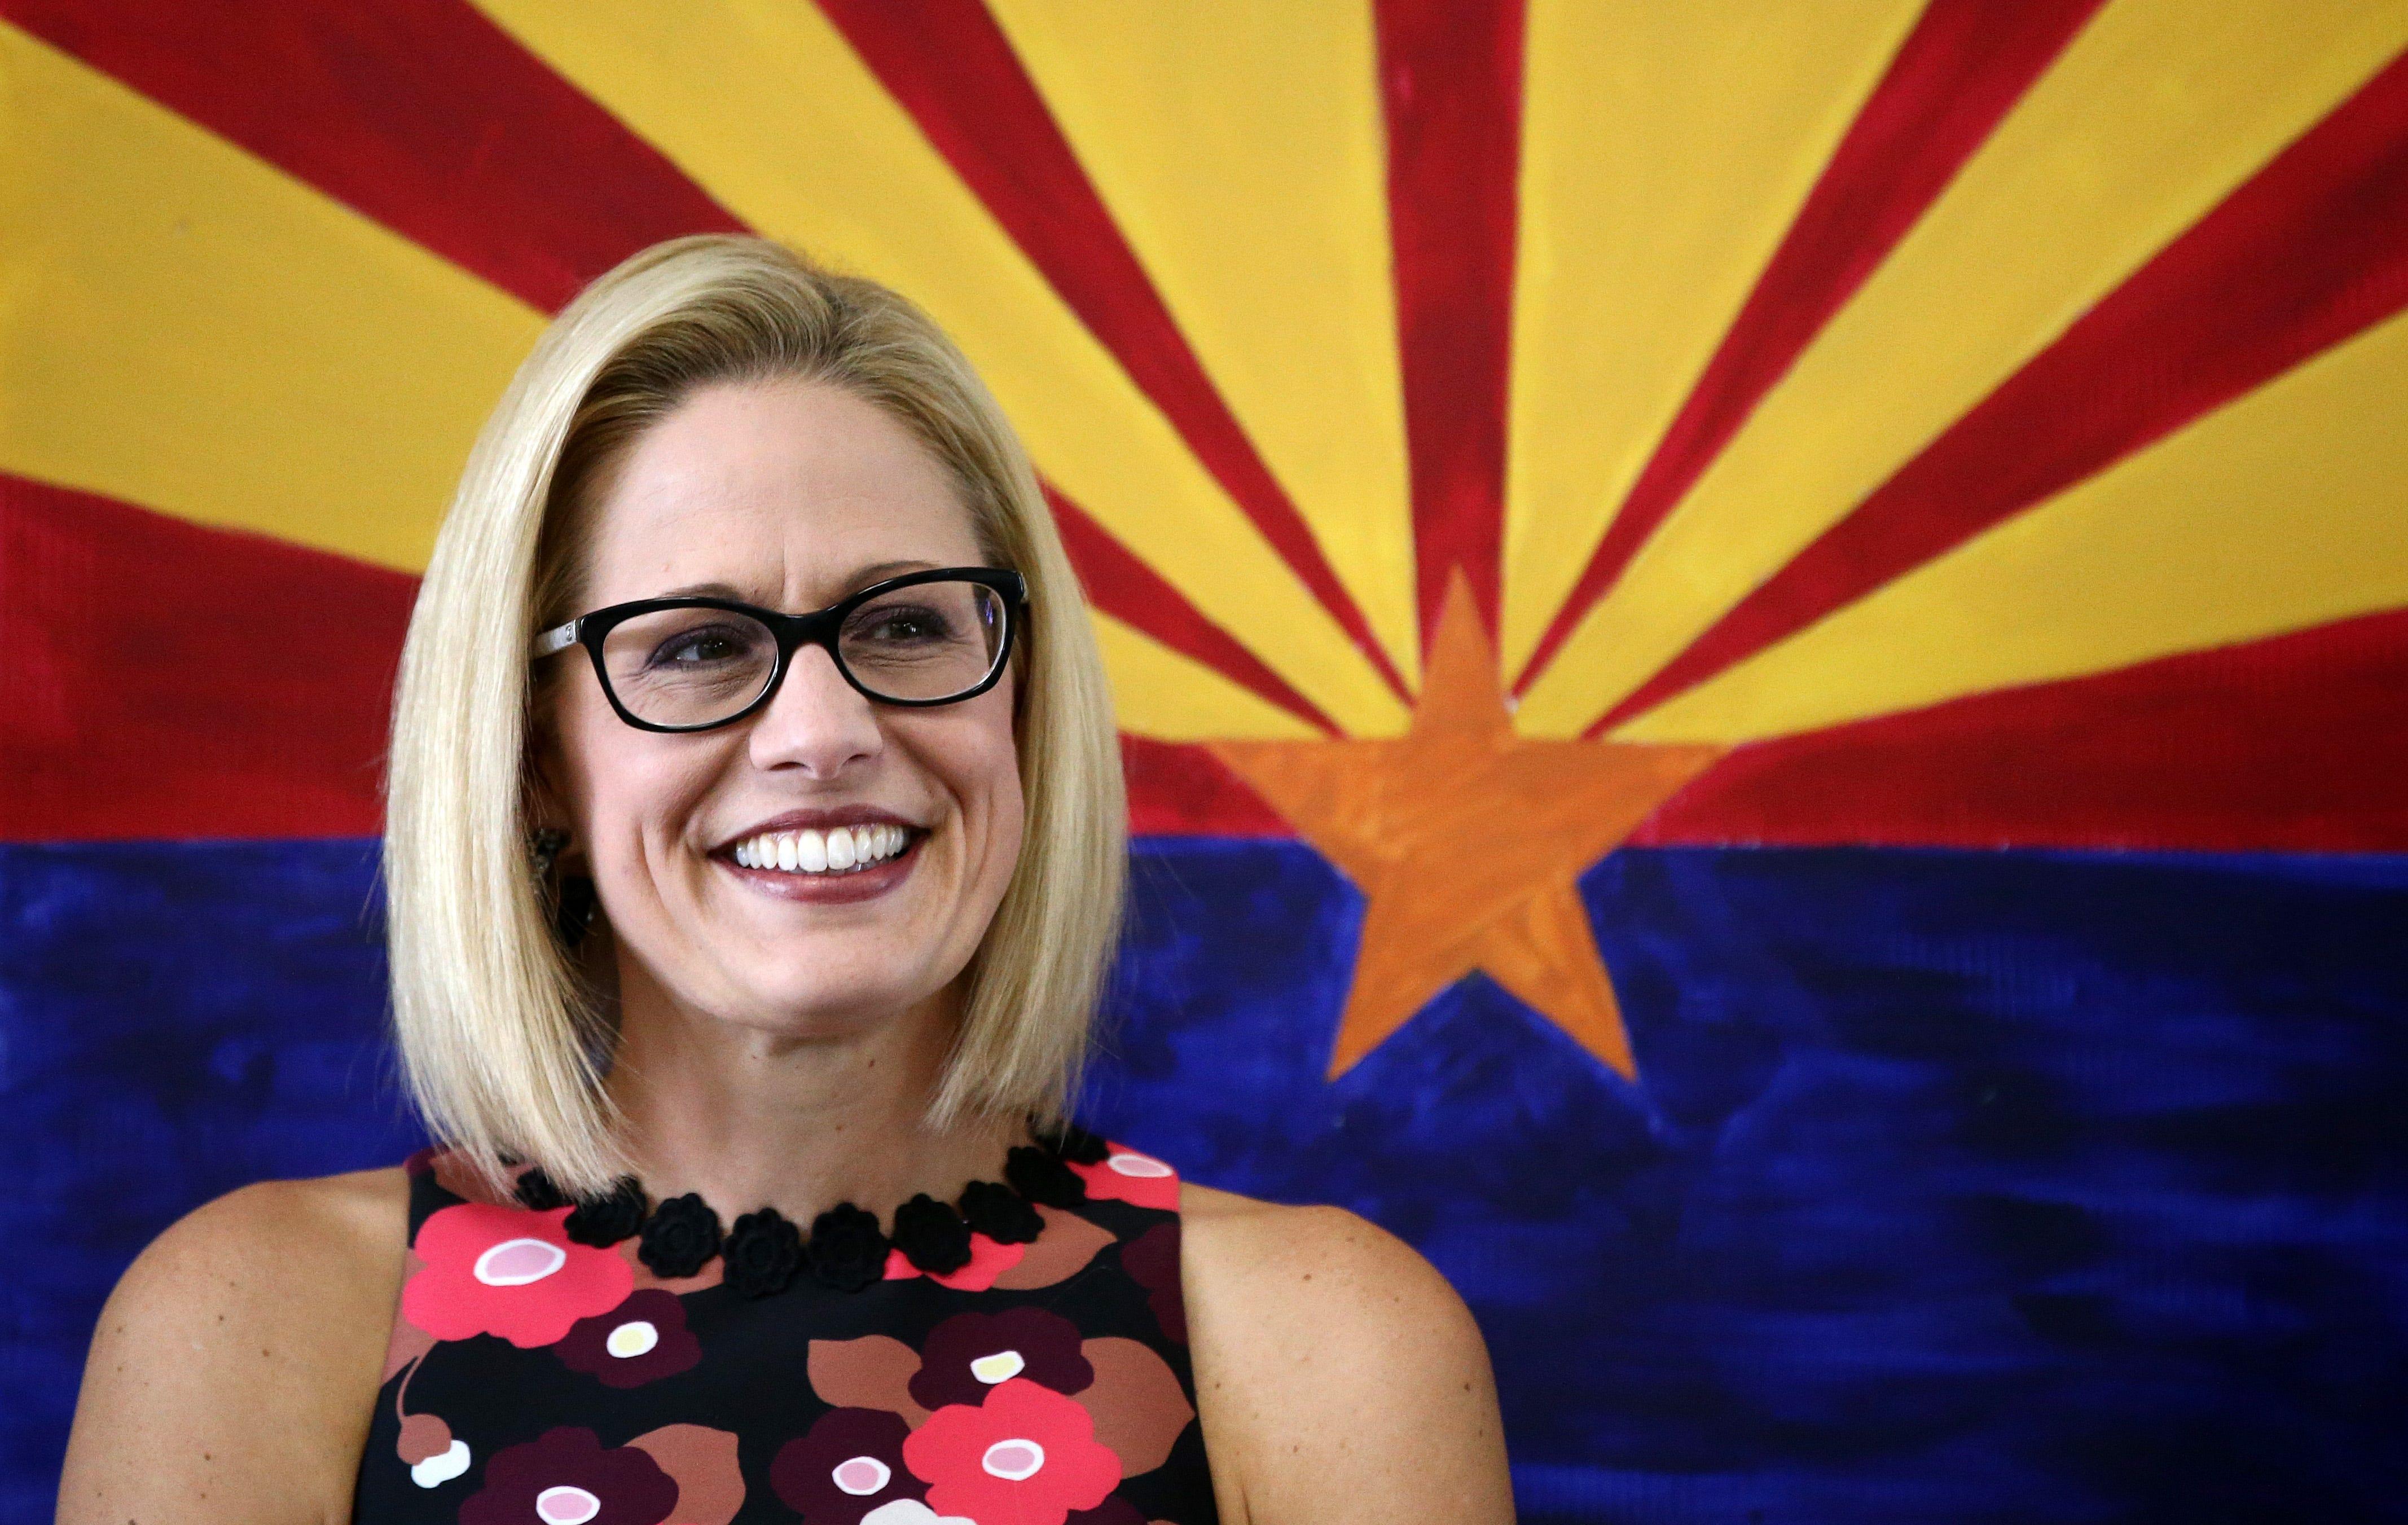 Arizona Democrats turned the state more purple in 2018. Will it last? | AZ Central